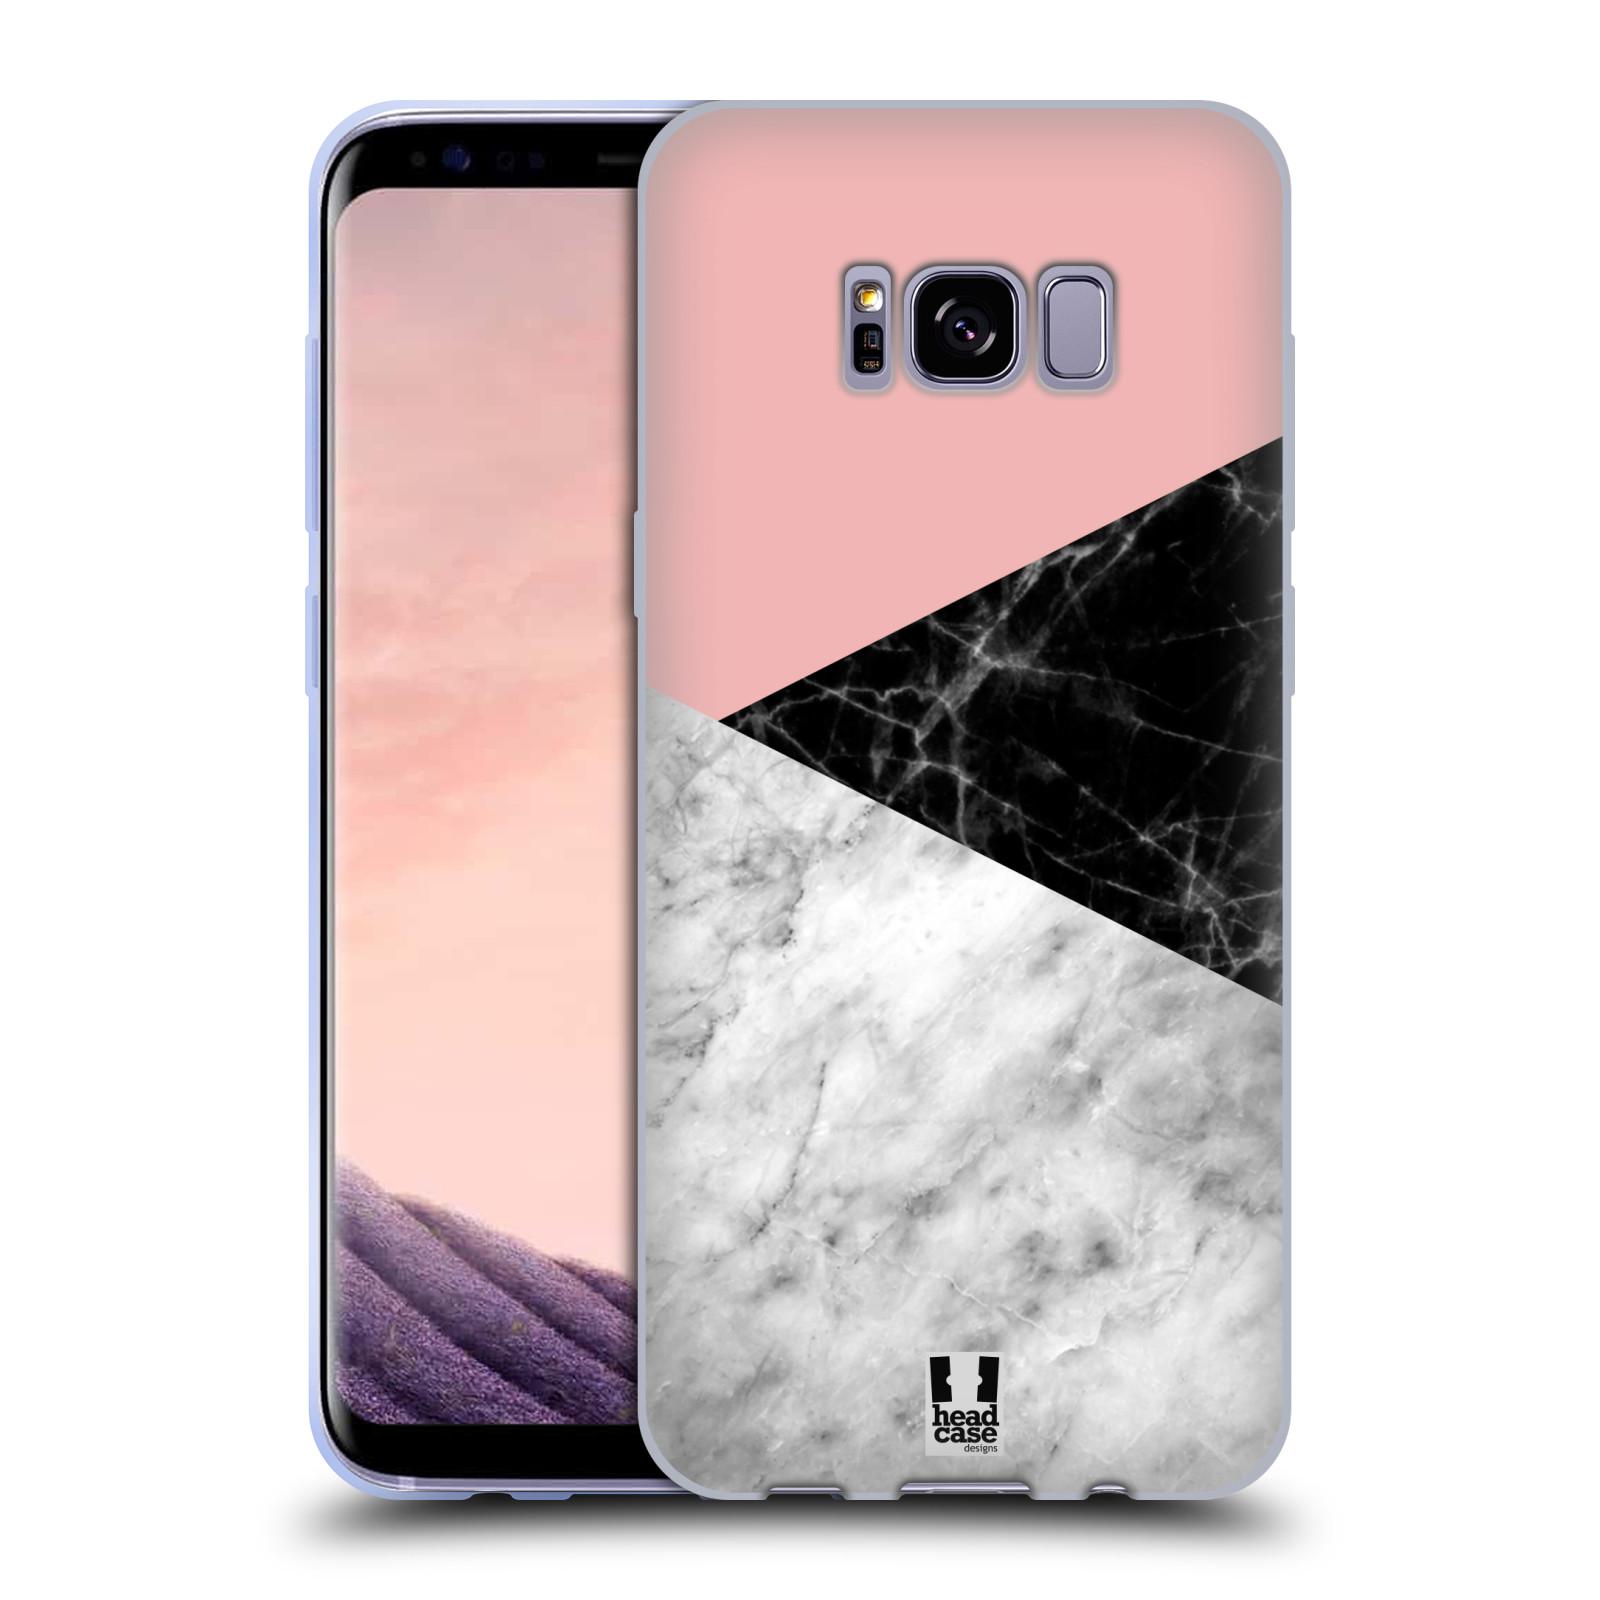 Silikonové pouzdro na mobil Samsung Galaxy S8+ (Plus) - Head Case - Mramor mix